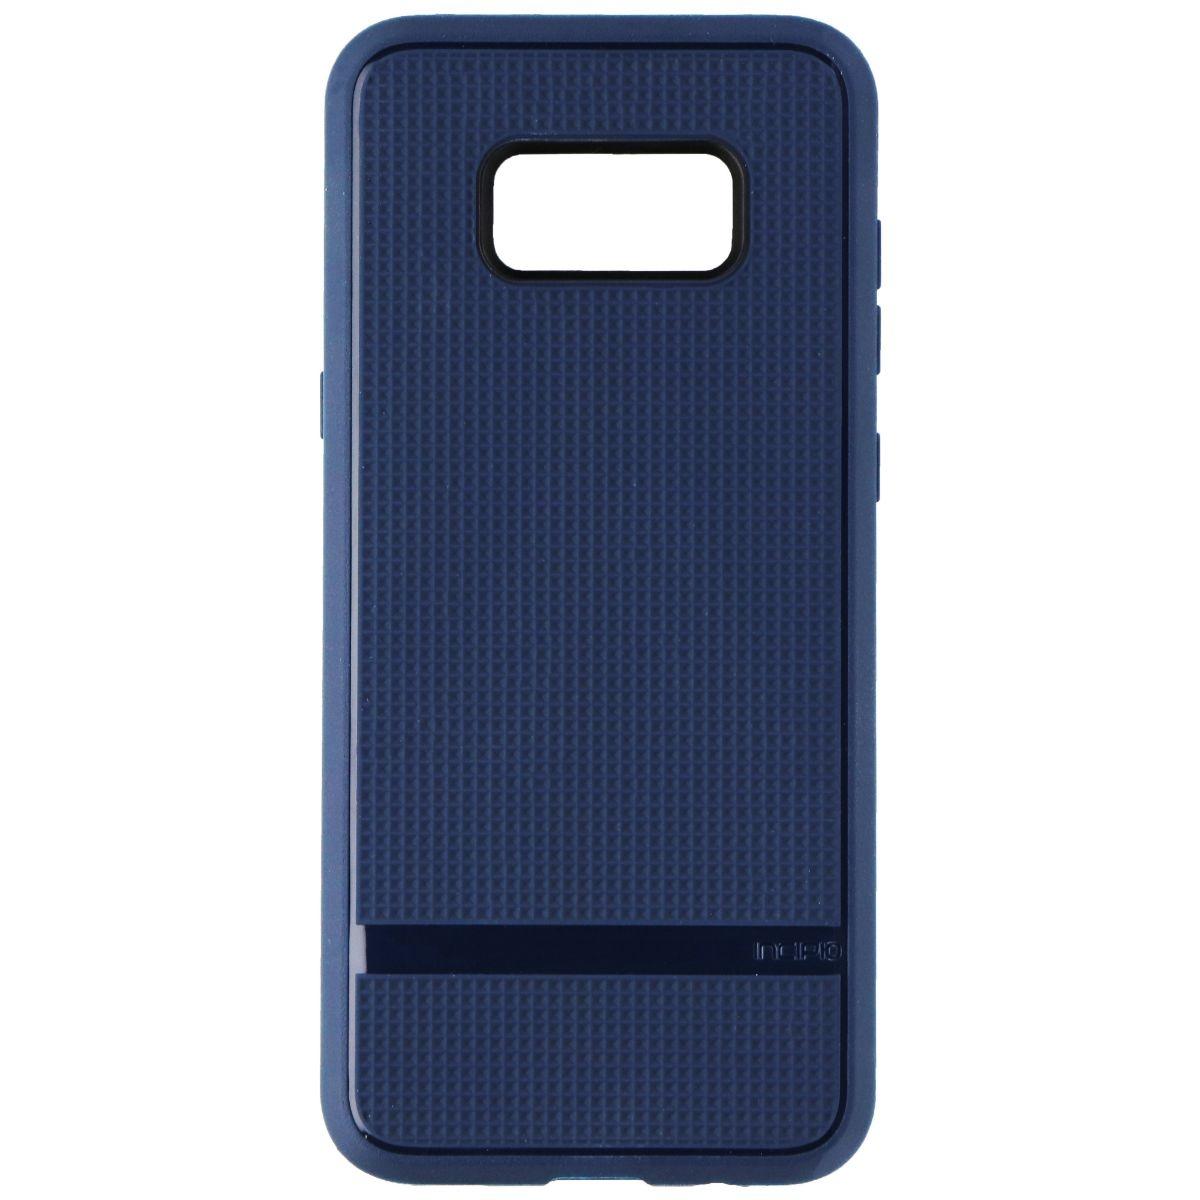 Incipio NGP Advanced Protection Case for Samsung Galaxy S8+ (Plus) - Navy Blue